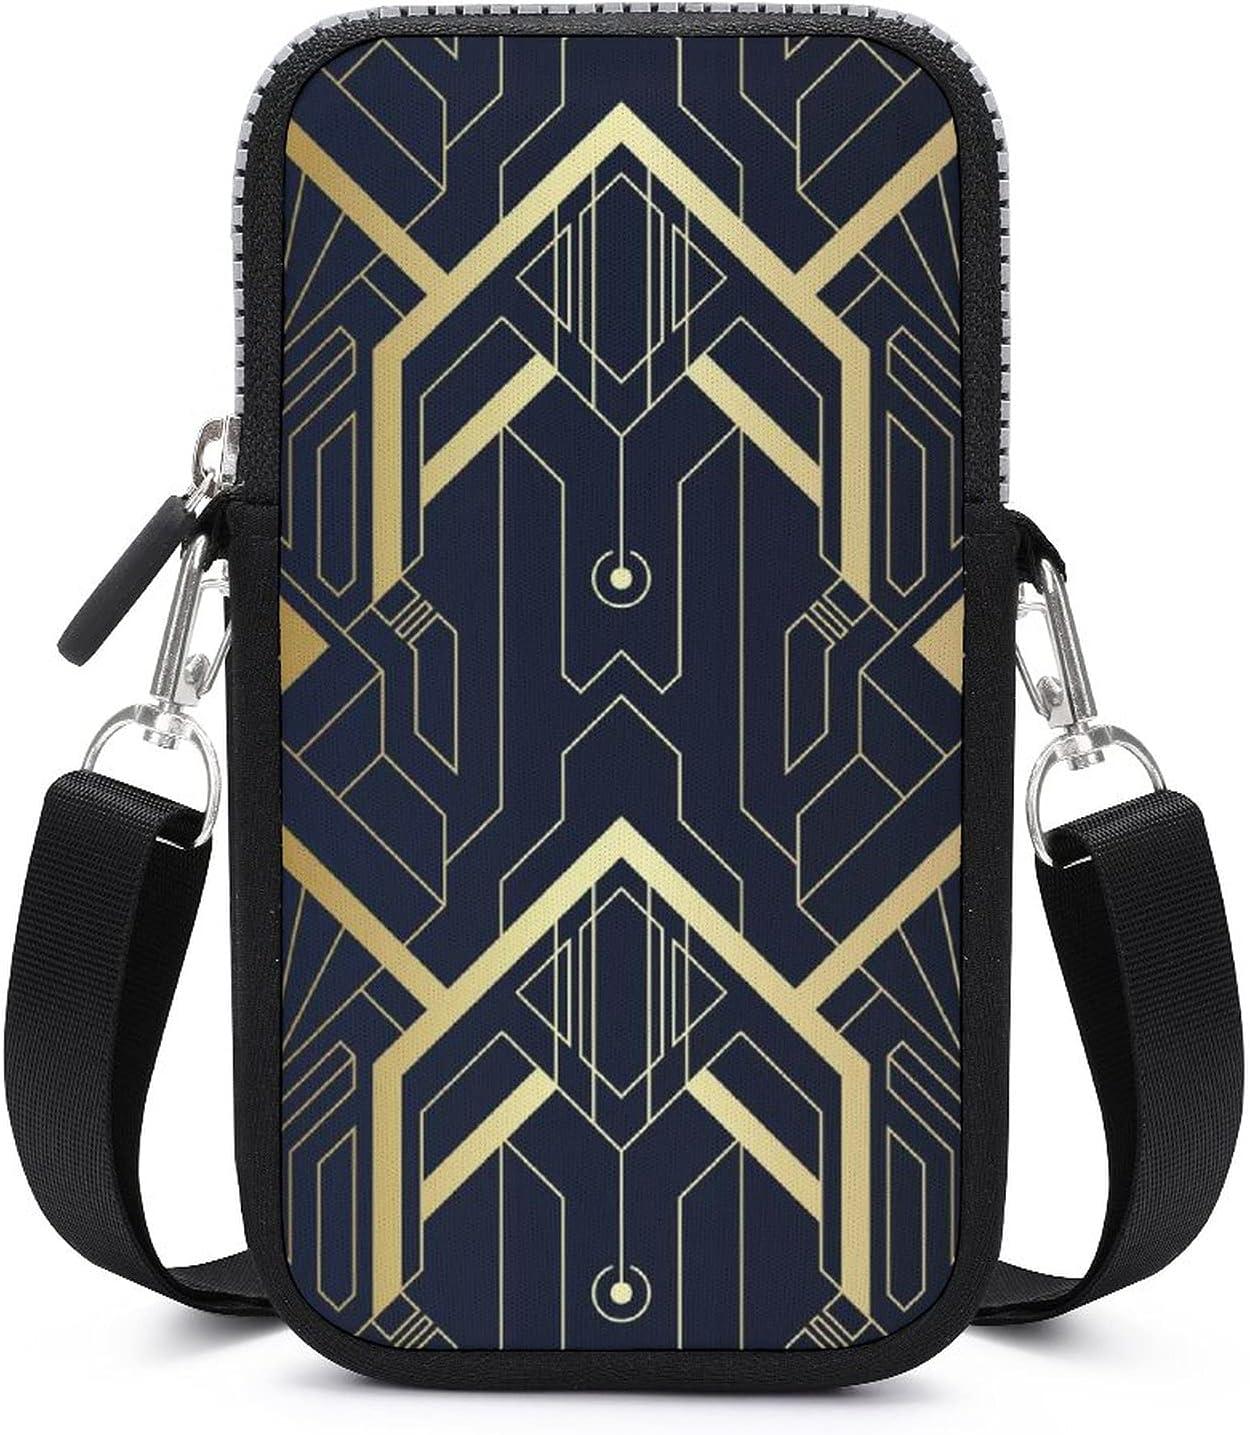 SWEET TANG Abstract Art Seamless Blue and Golden Phone Riding Multipurpose Handbag - Passport, Credit Card Adjustable Shoulder Strap, Holder Wristlet Convertible Cross Body Bag